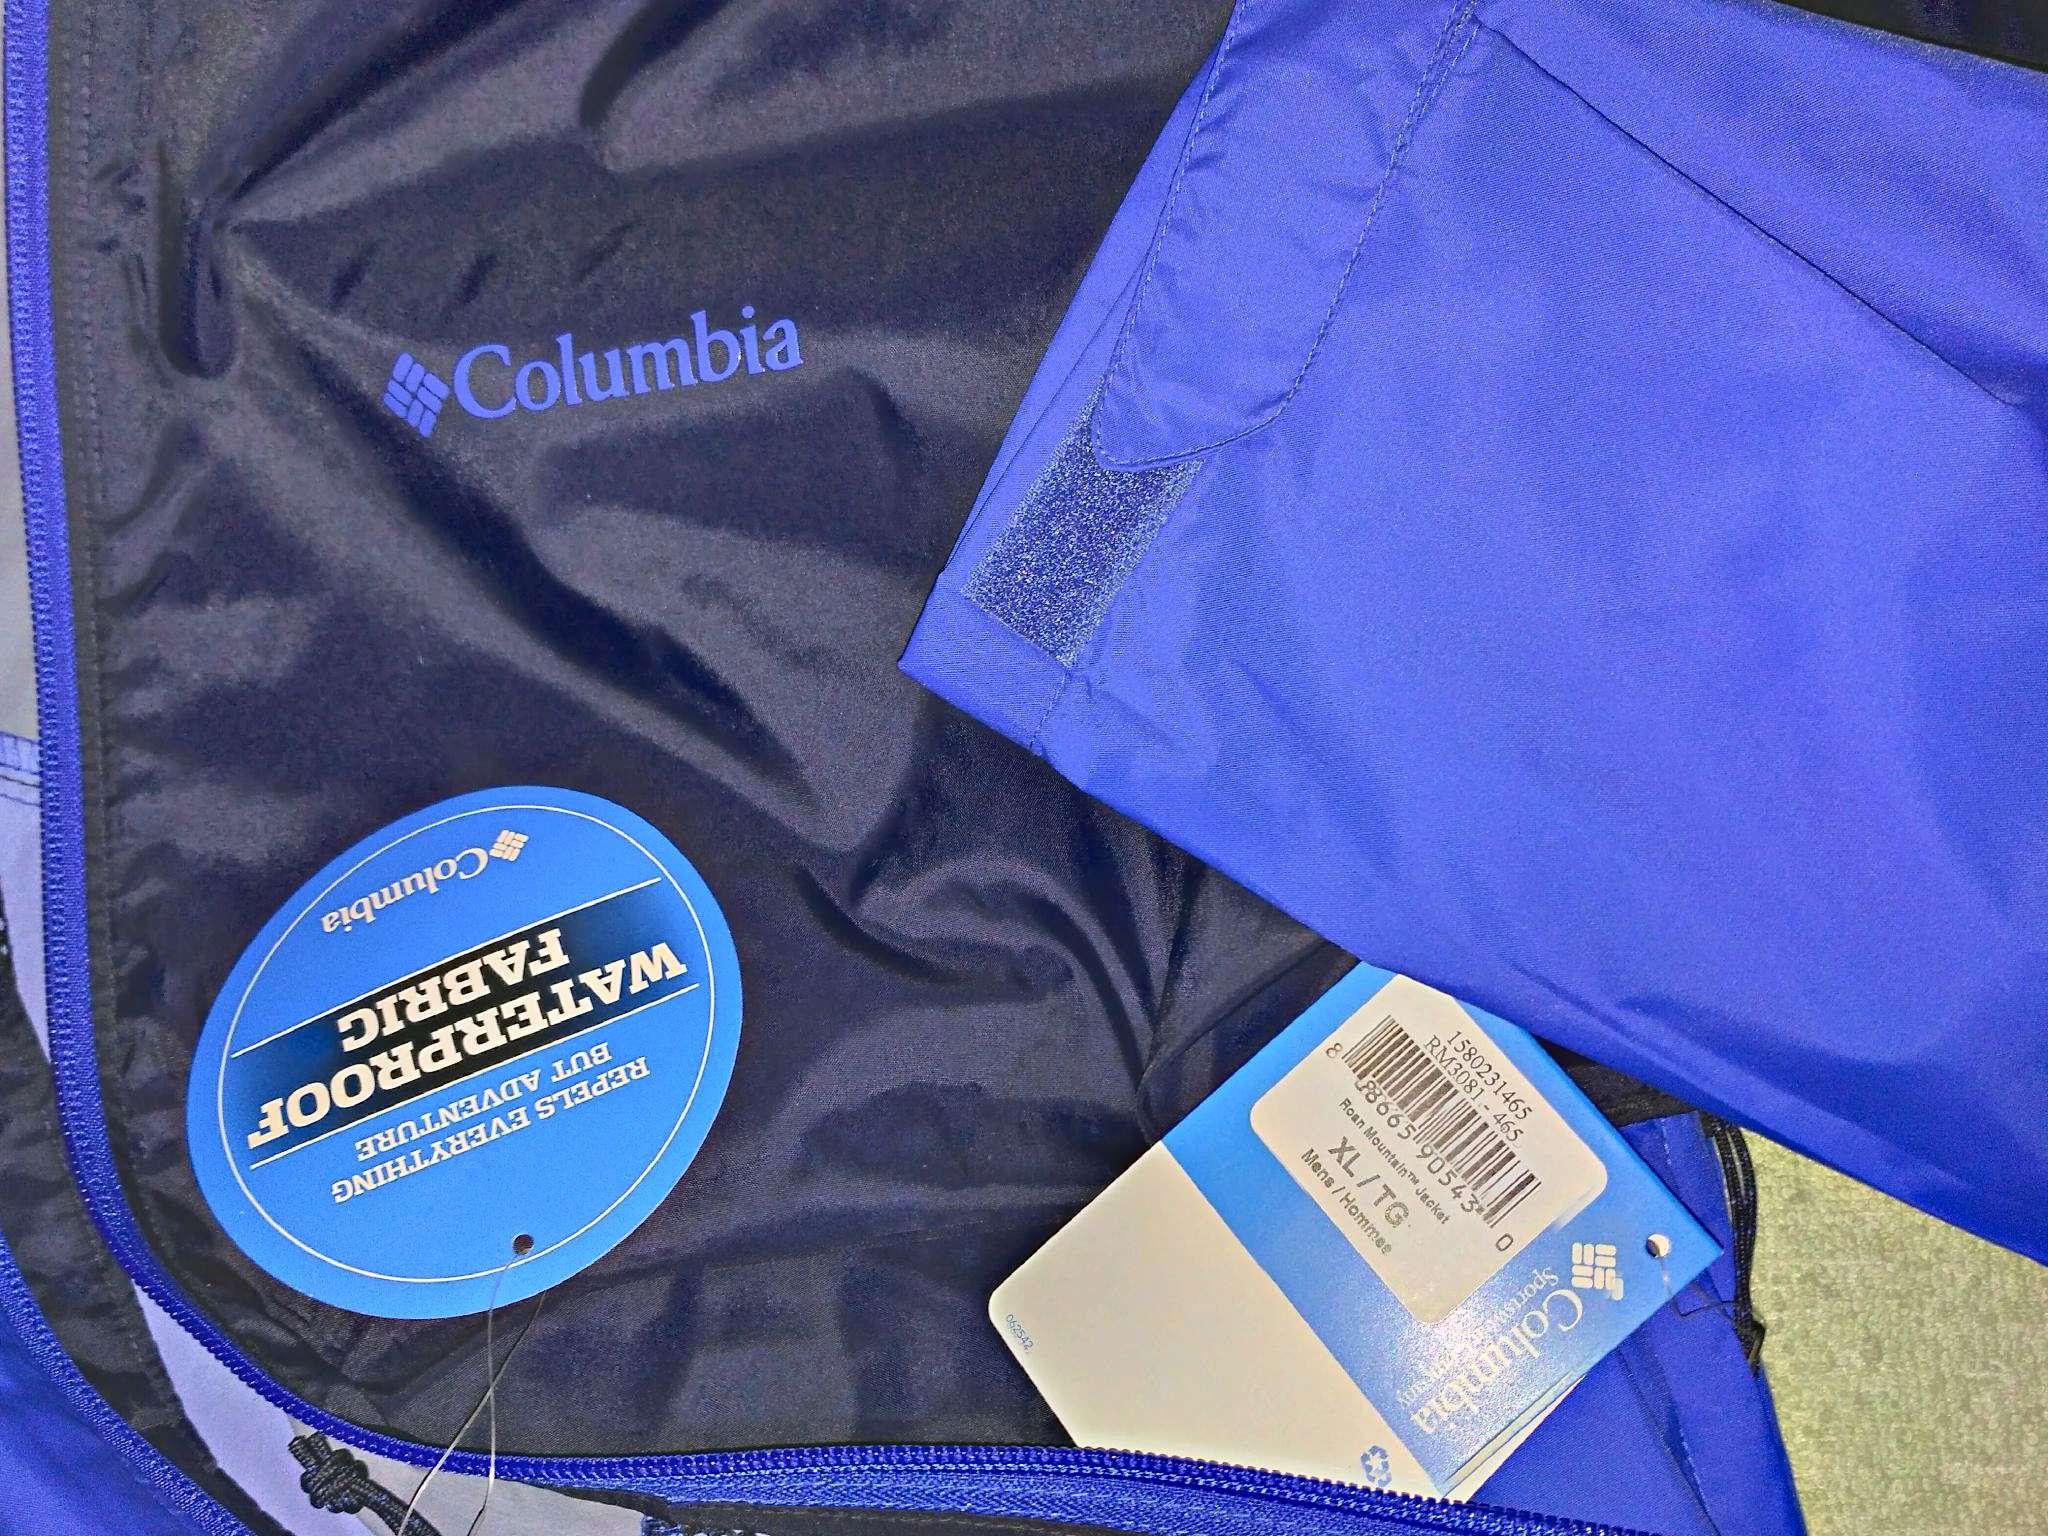 771eb74edd6d Ветровка Columbia 1580231-465 мужская, цвет синий, рус. размер 52 ...